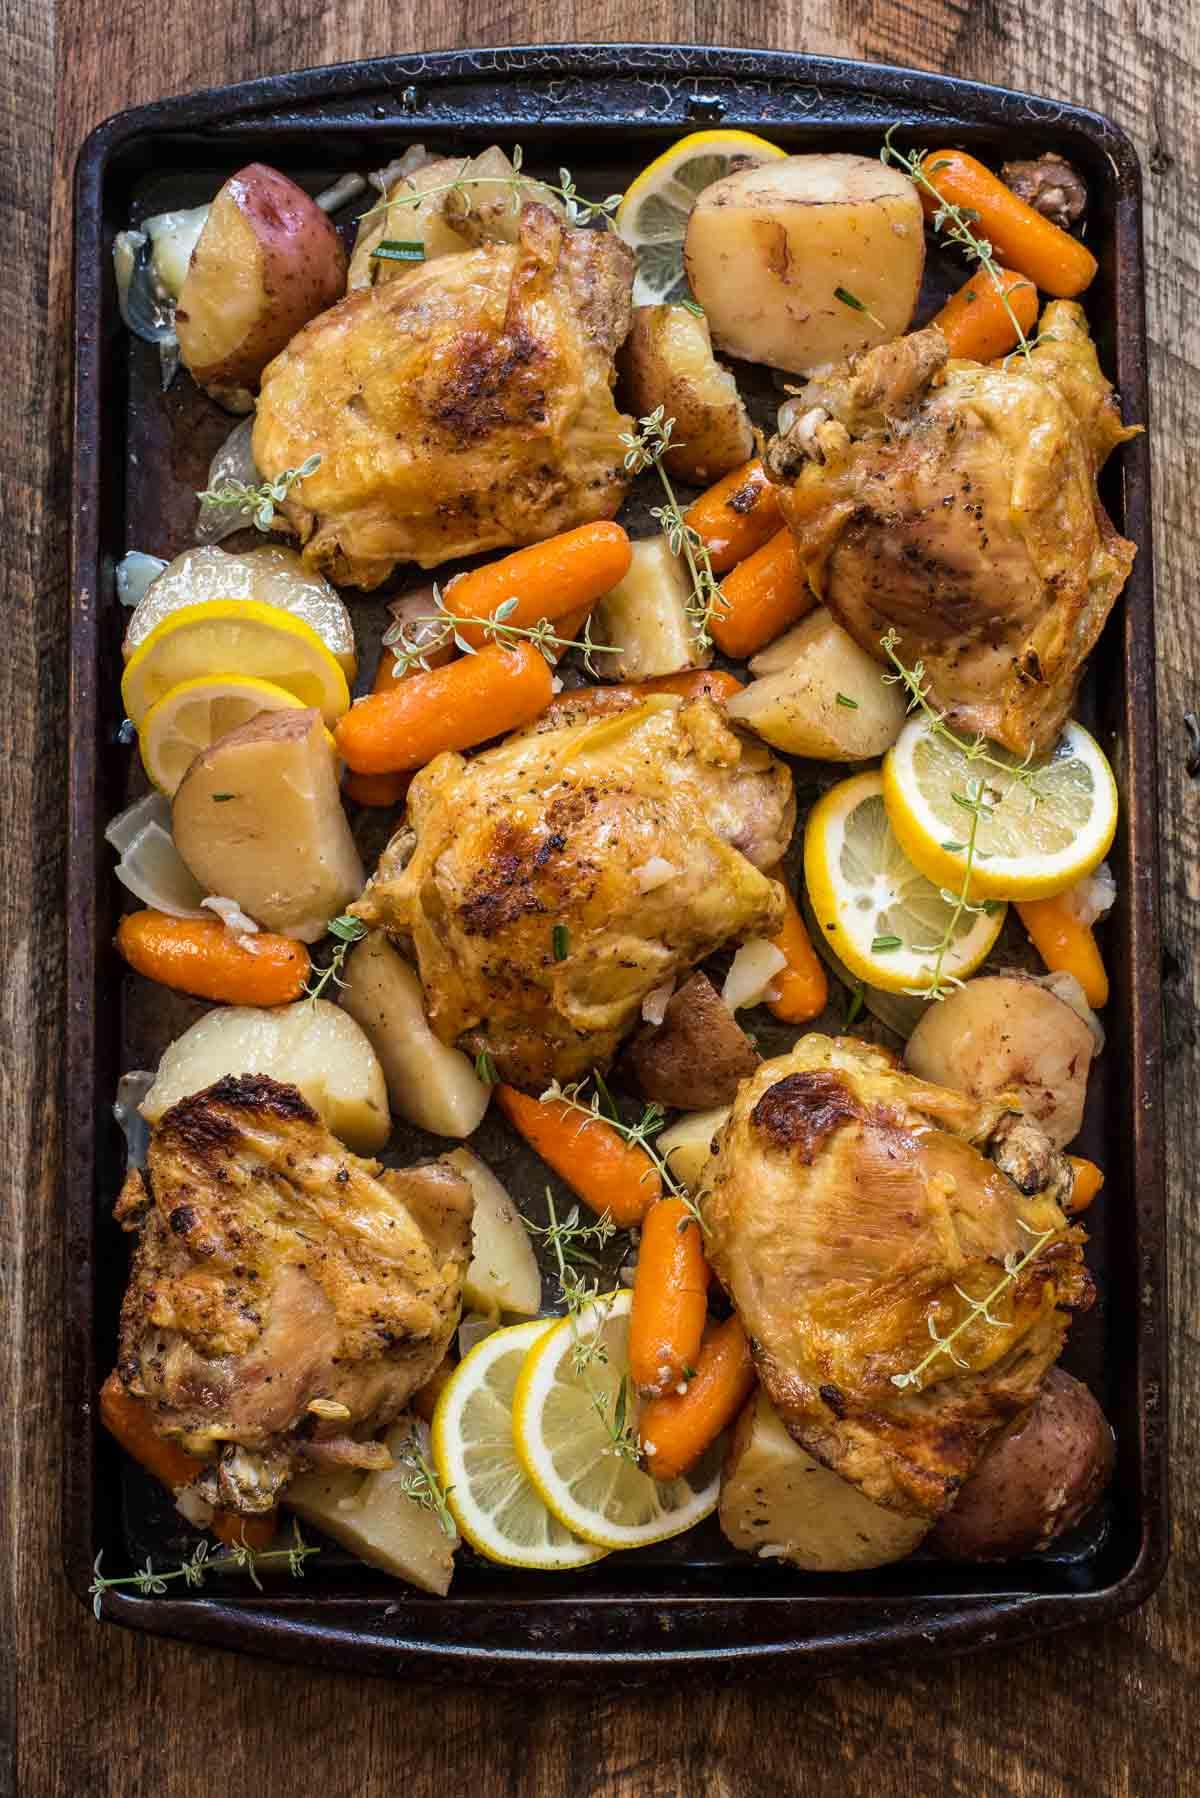 Crock Pot Lemon Garlic Chicken shown on a sheet pan